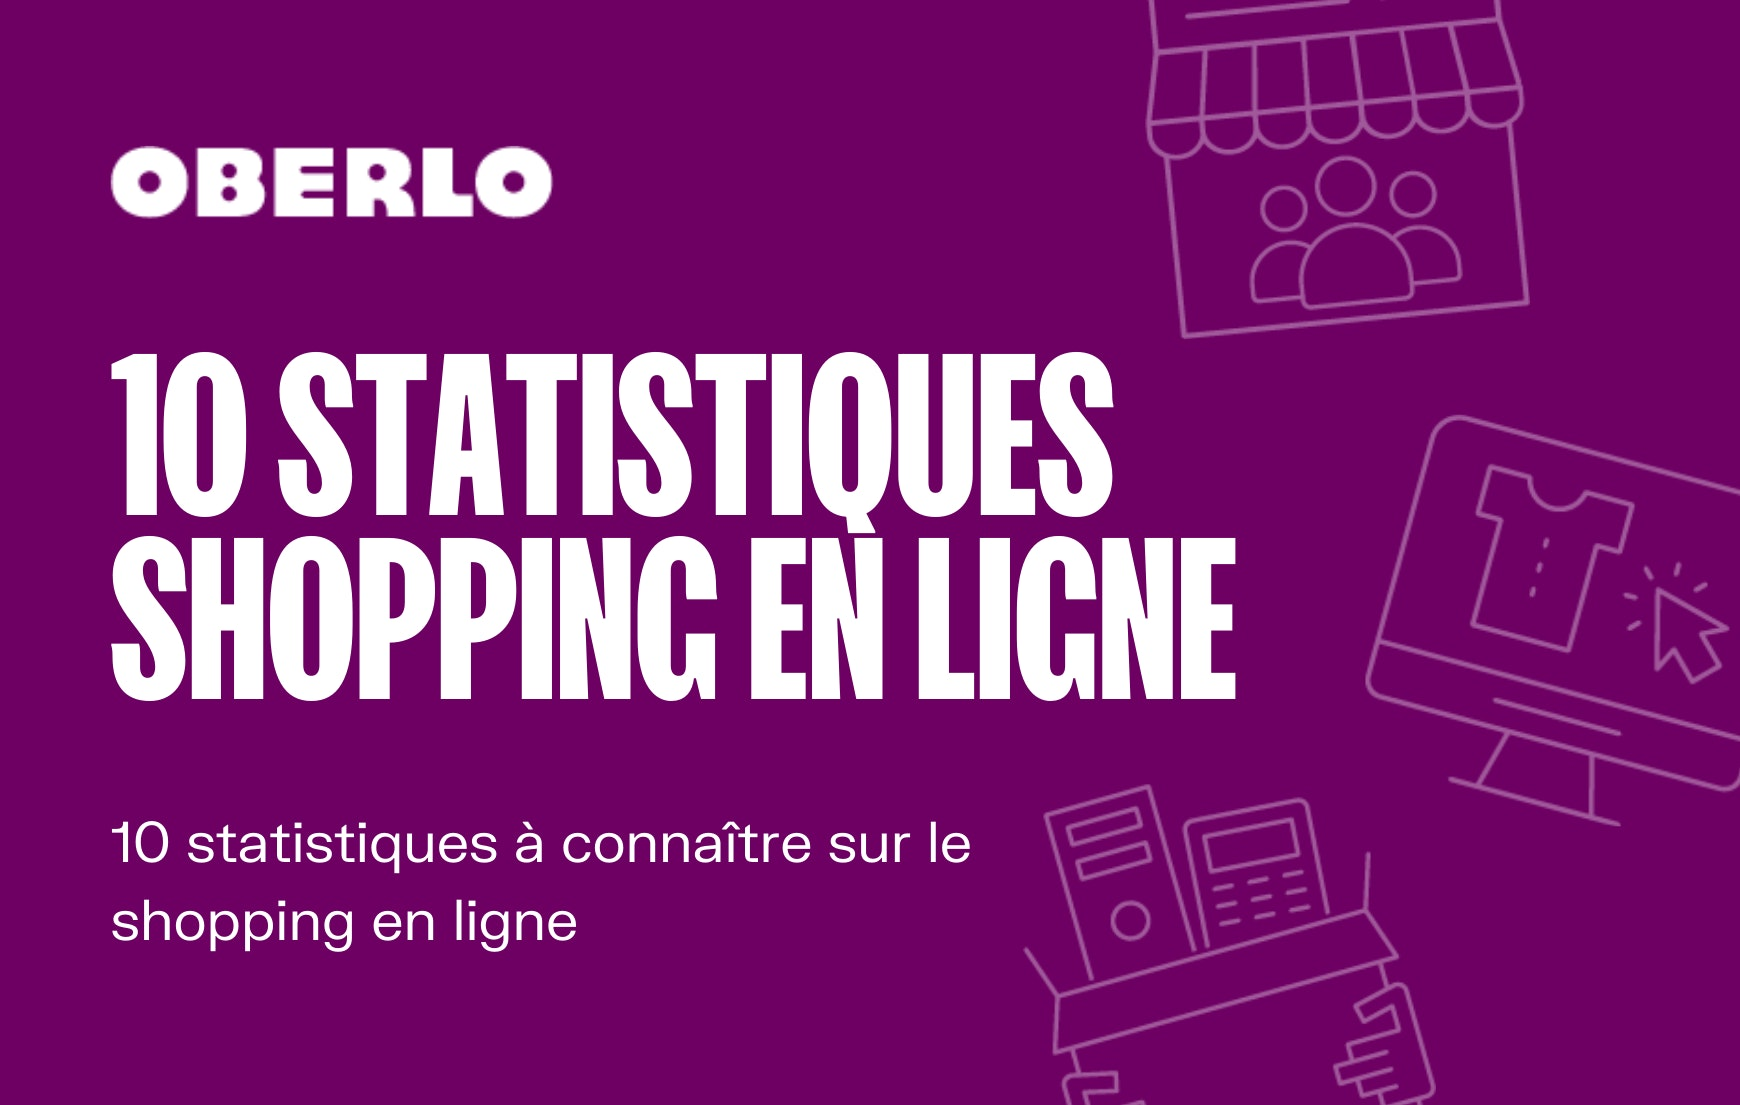 Shopping en ligne chiffres 2020 2021